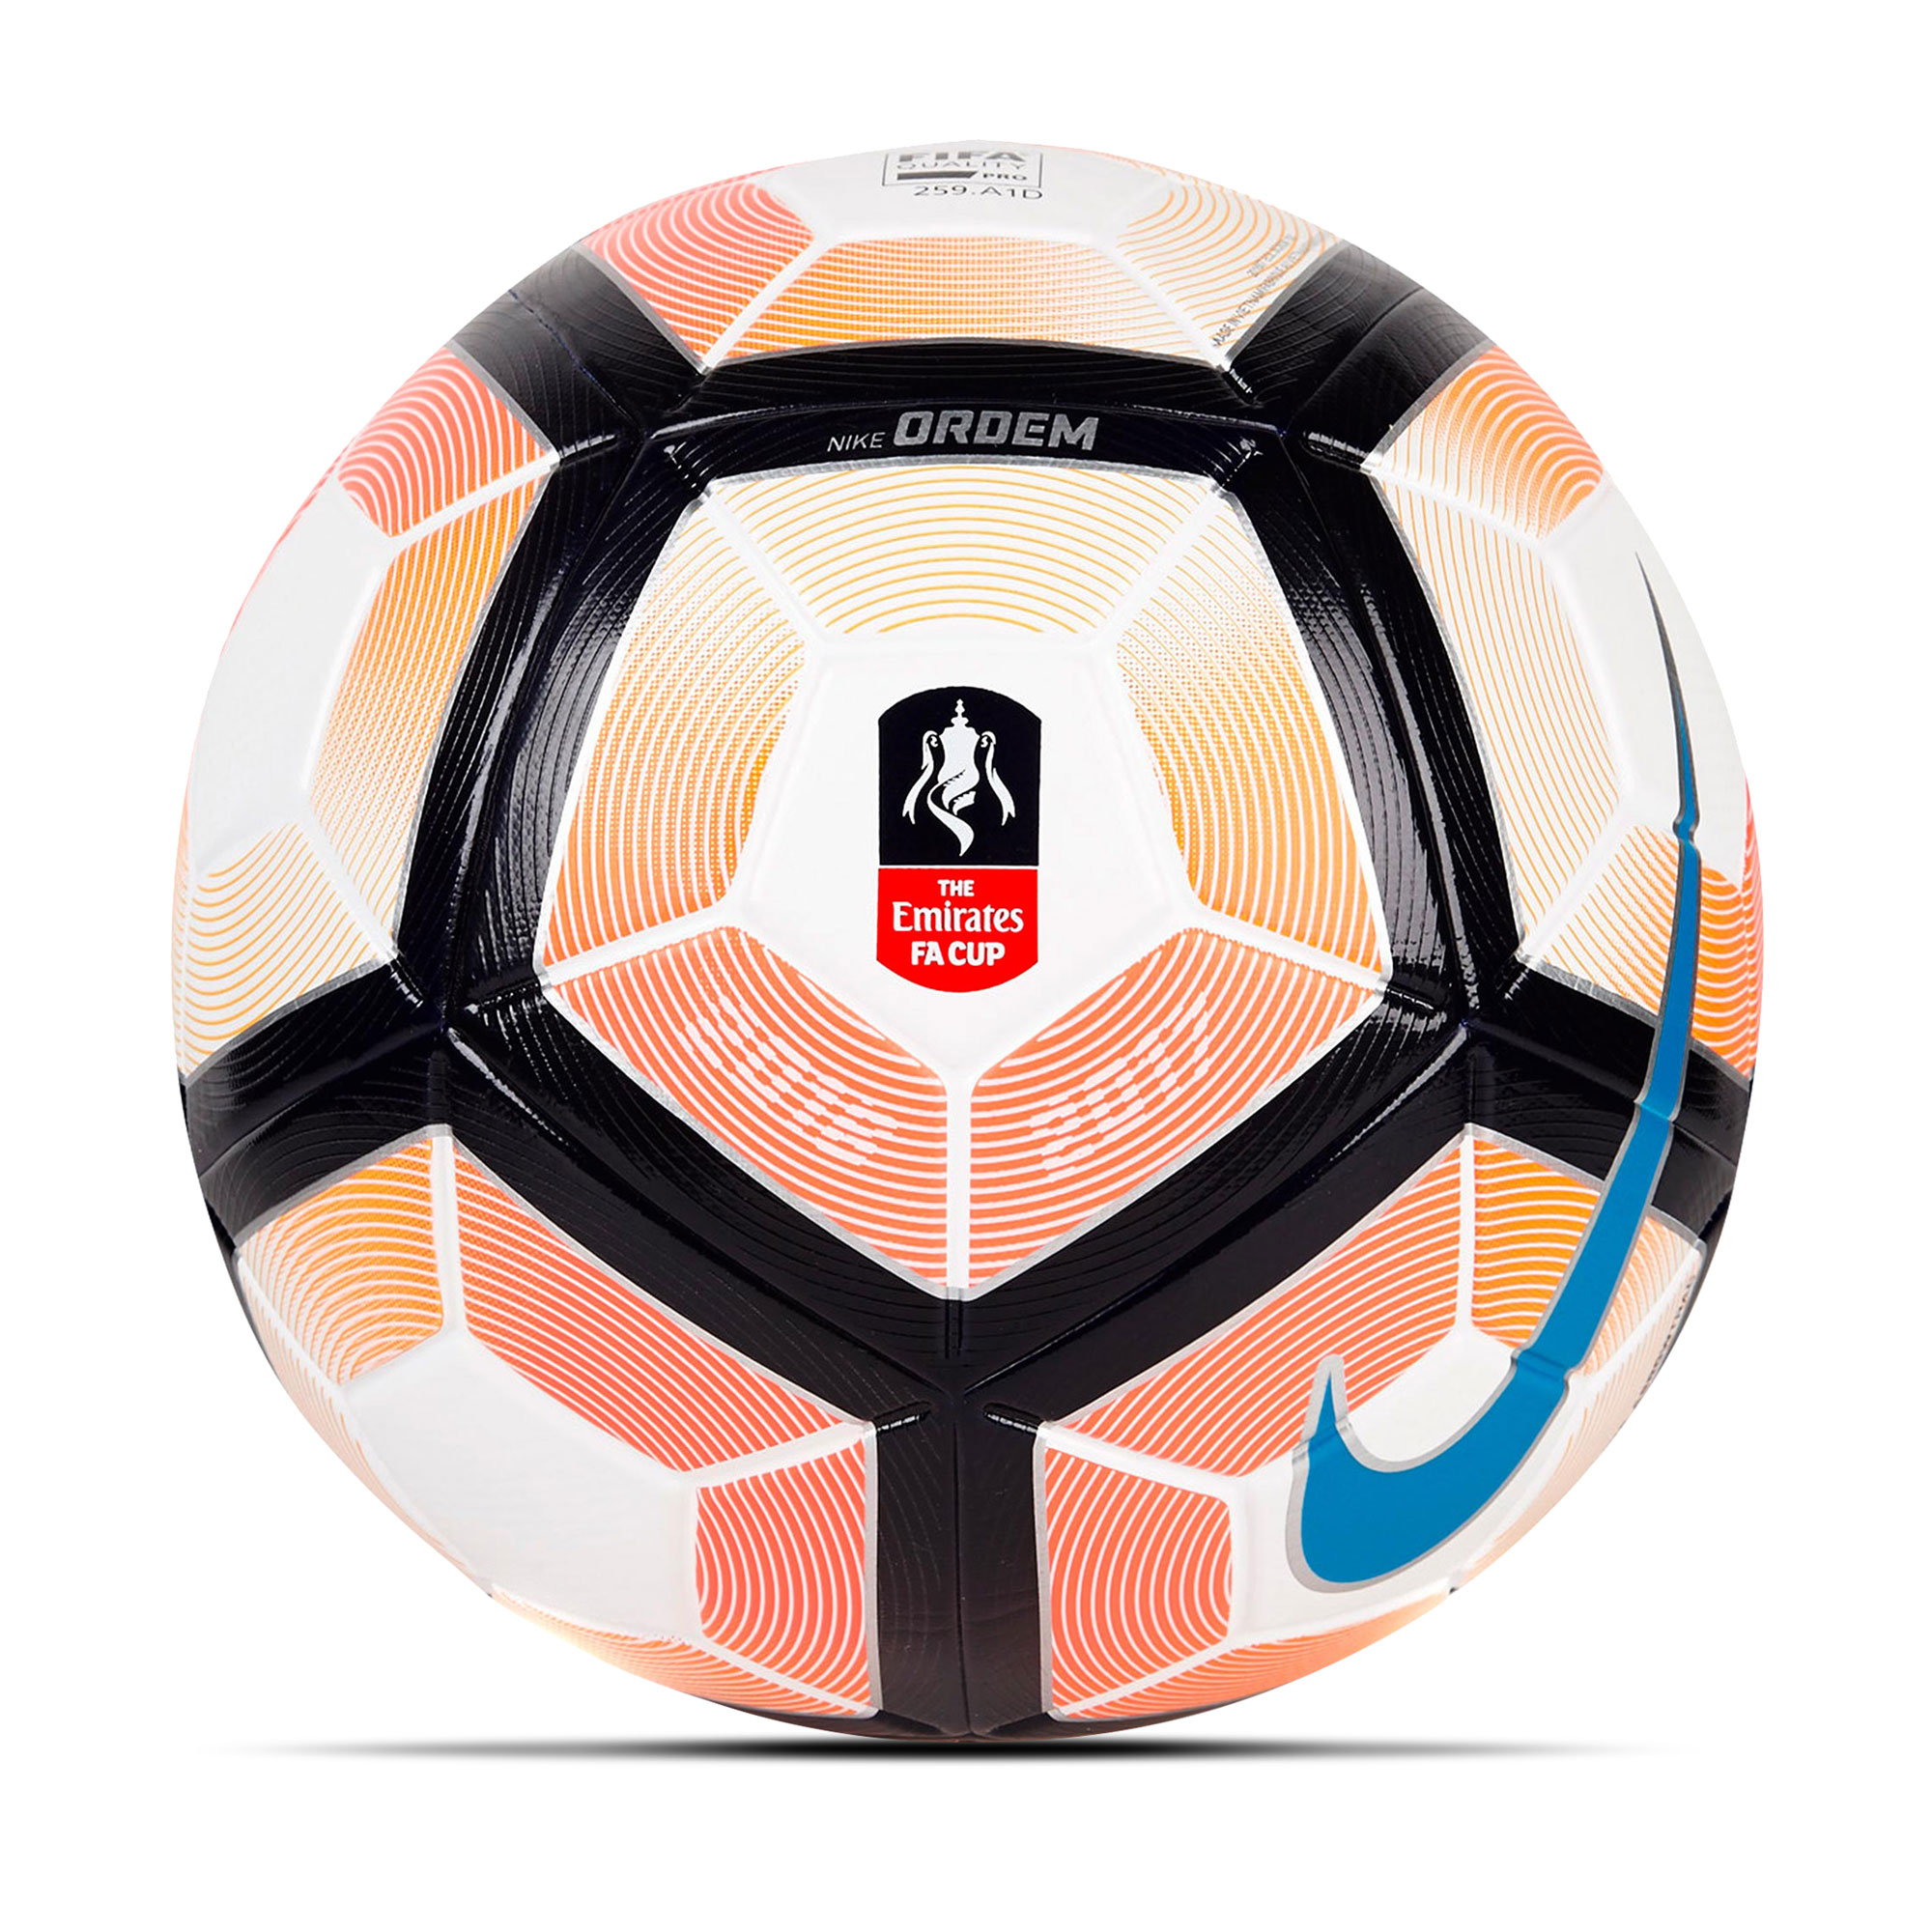 Nike Ordem 4 FA Cup Football - White/Bright Mango/Cyan - Size 5